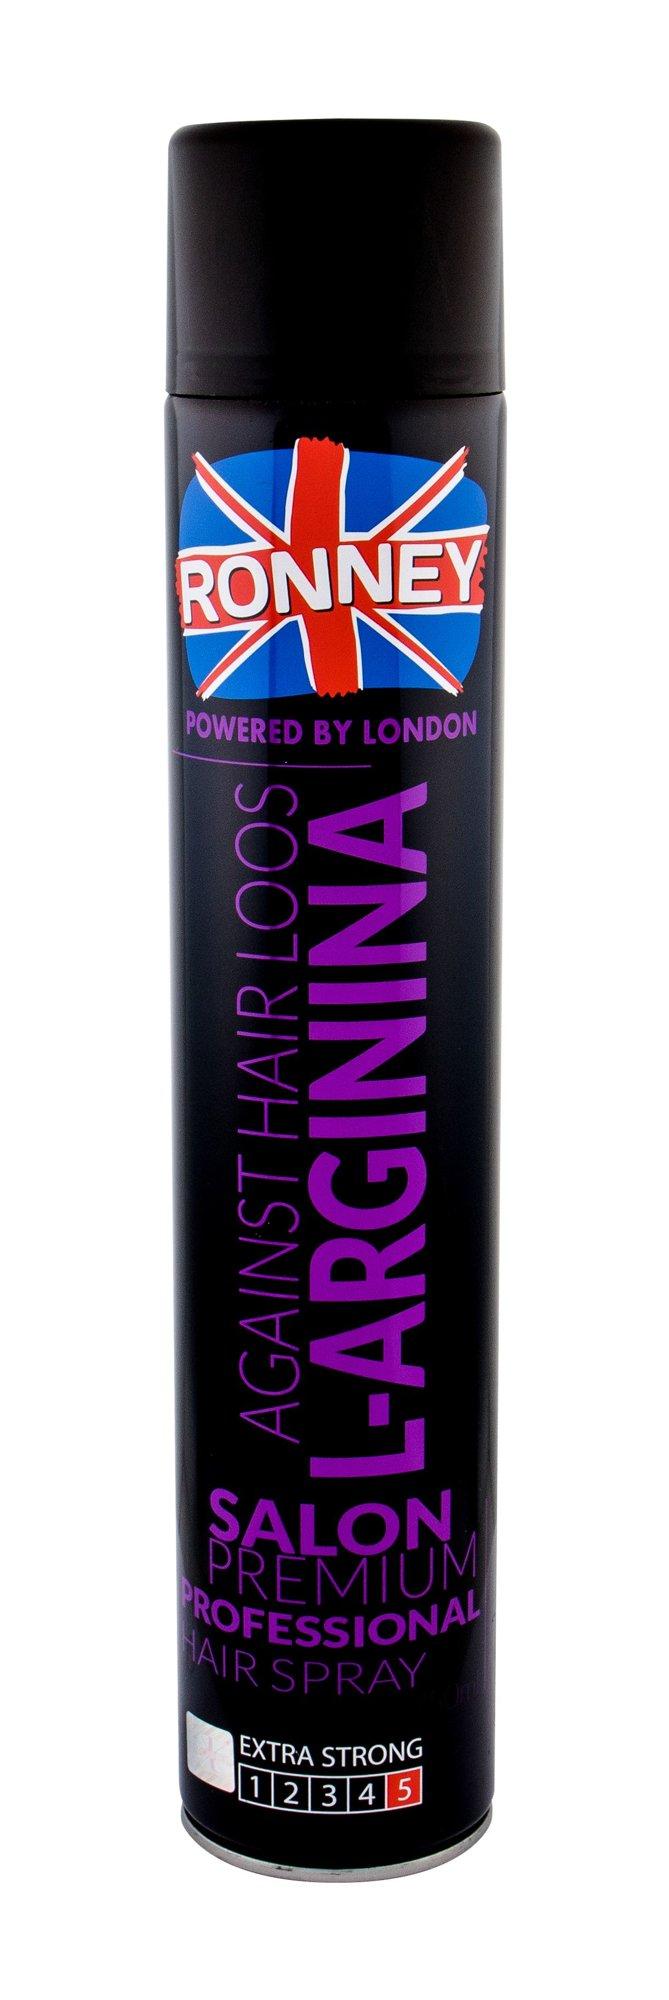 Ronney Salon Premium Professional Hair Spray 750ml